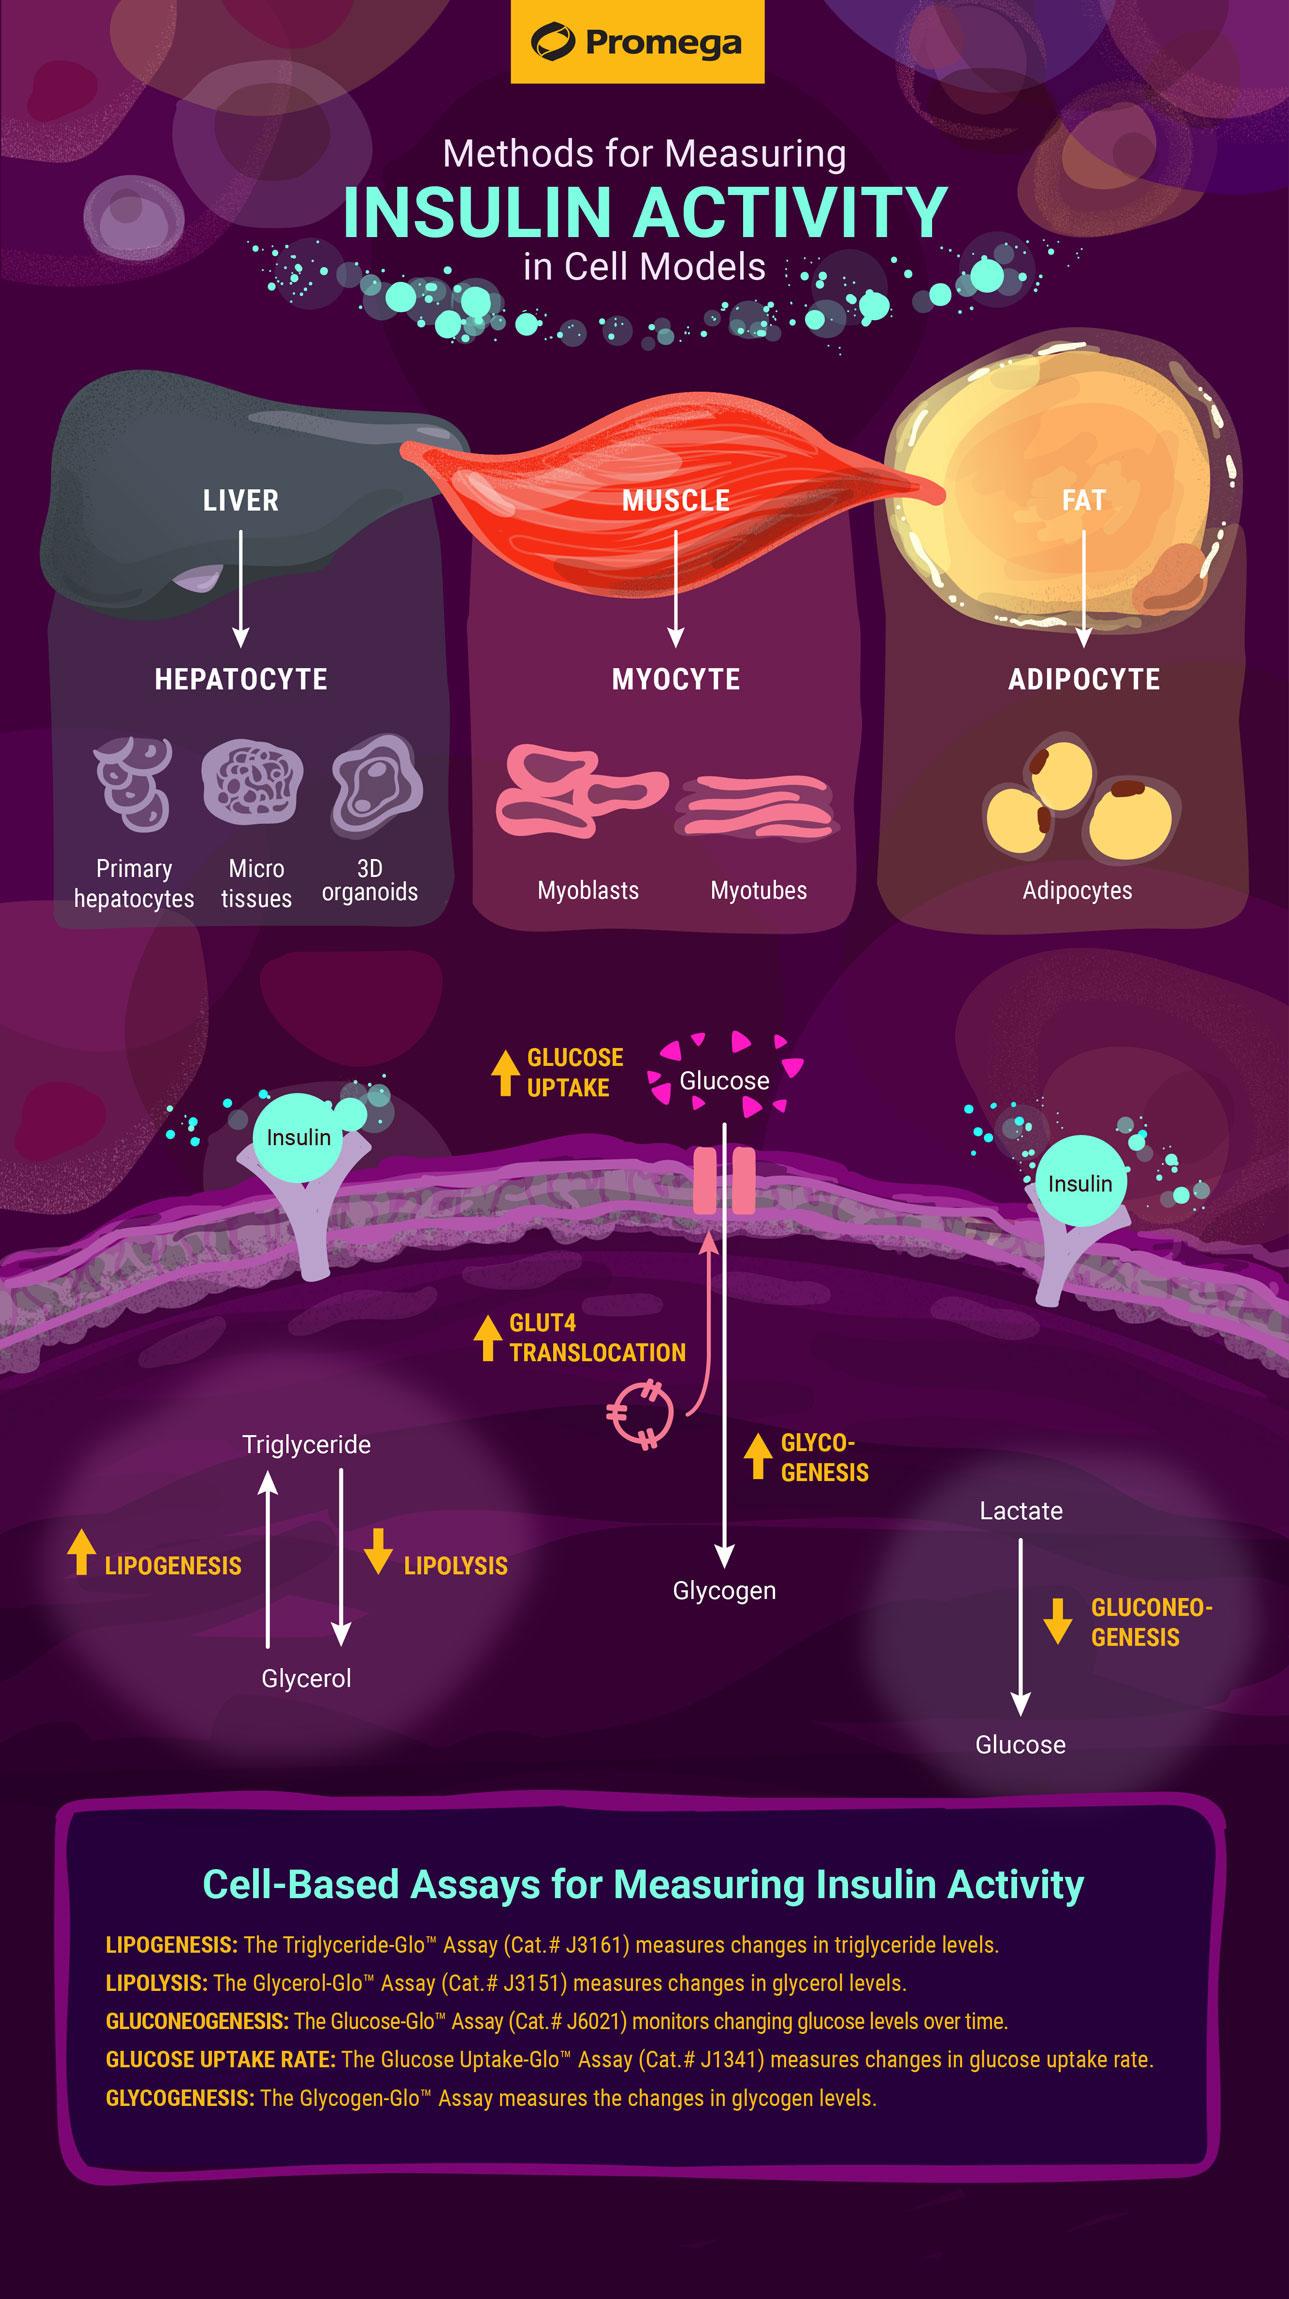 insulin-activity-assays-infographic-2020-05